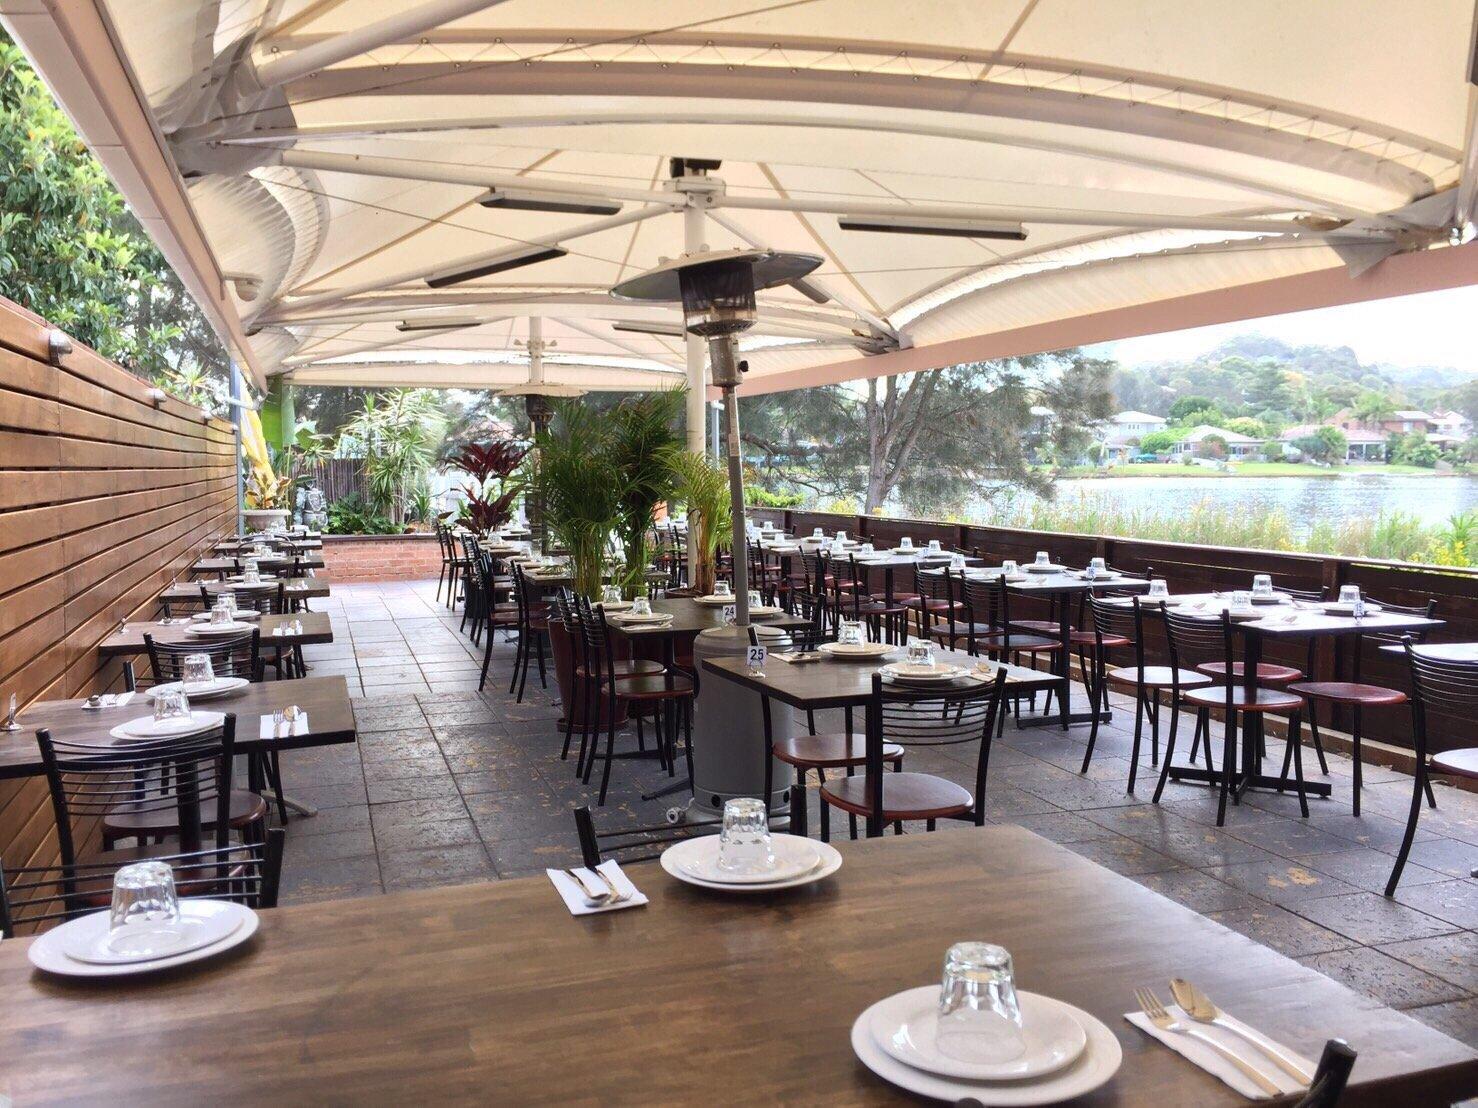 Rice and Lake Thai restaurant